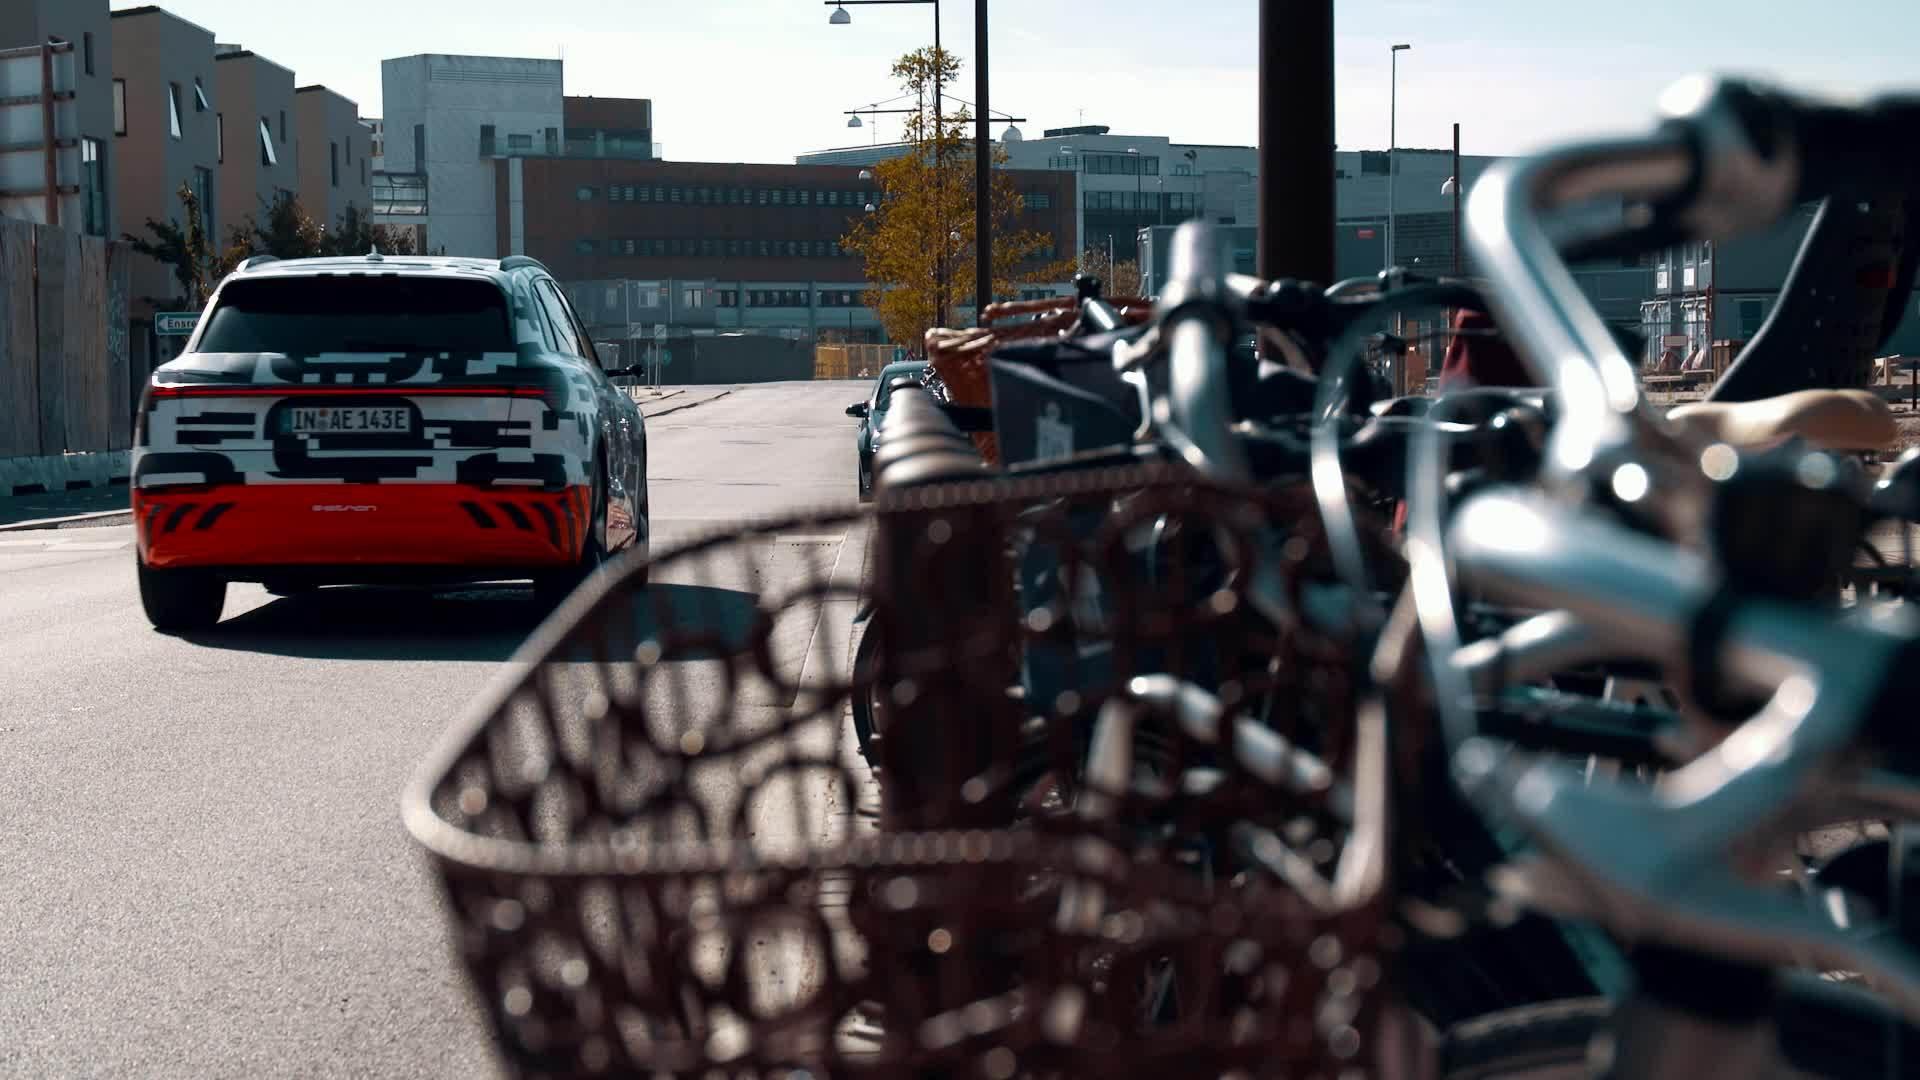 Audi e-tron Prototyp: Sound of Copenhagen